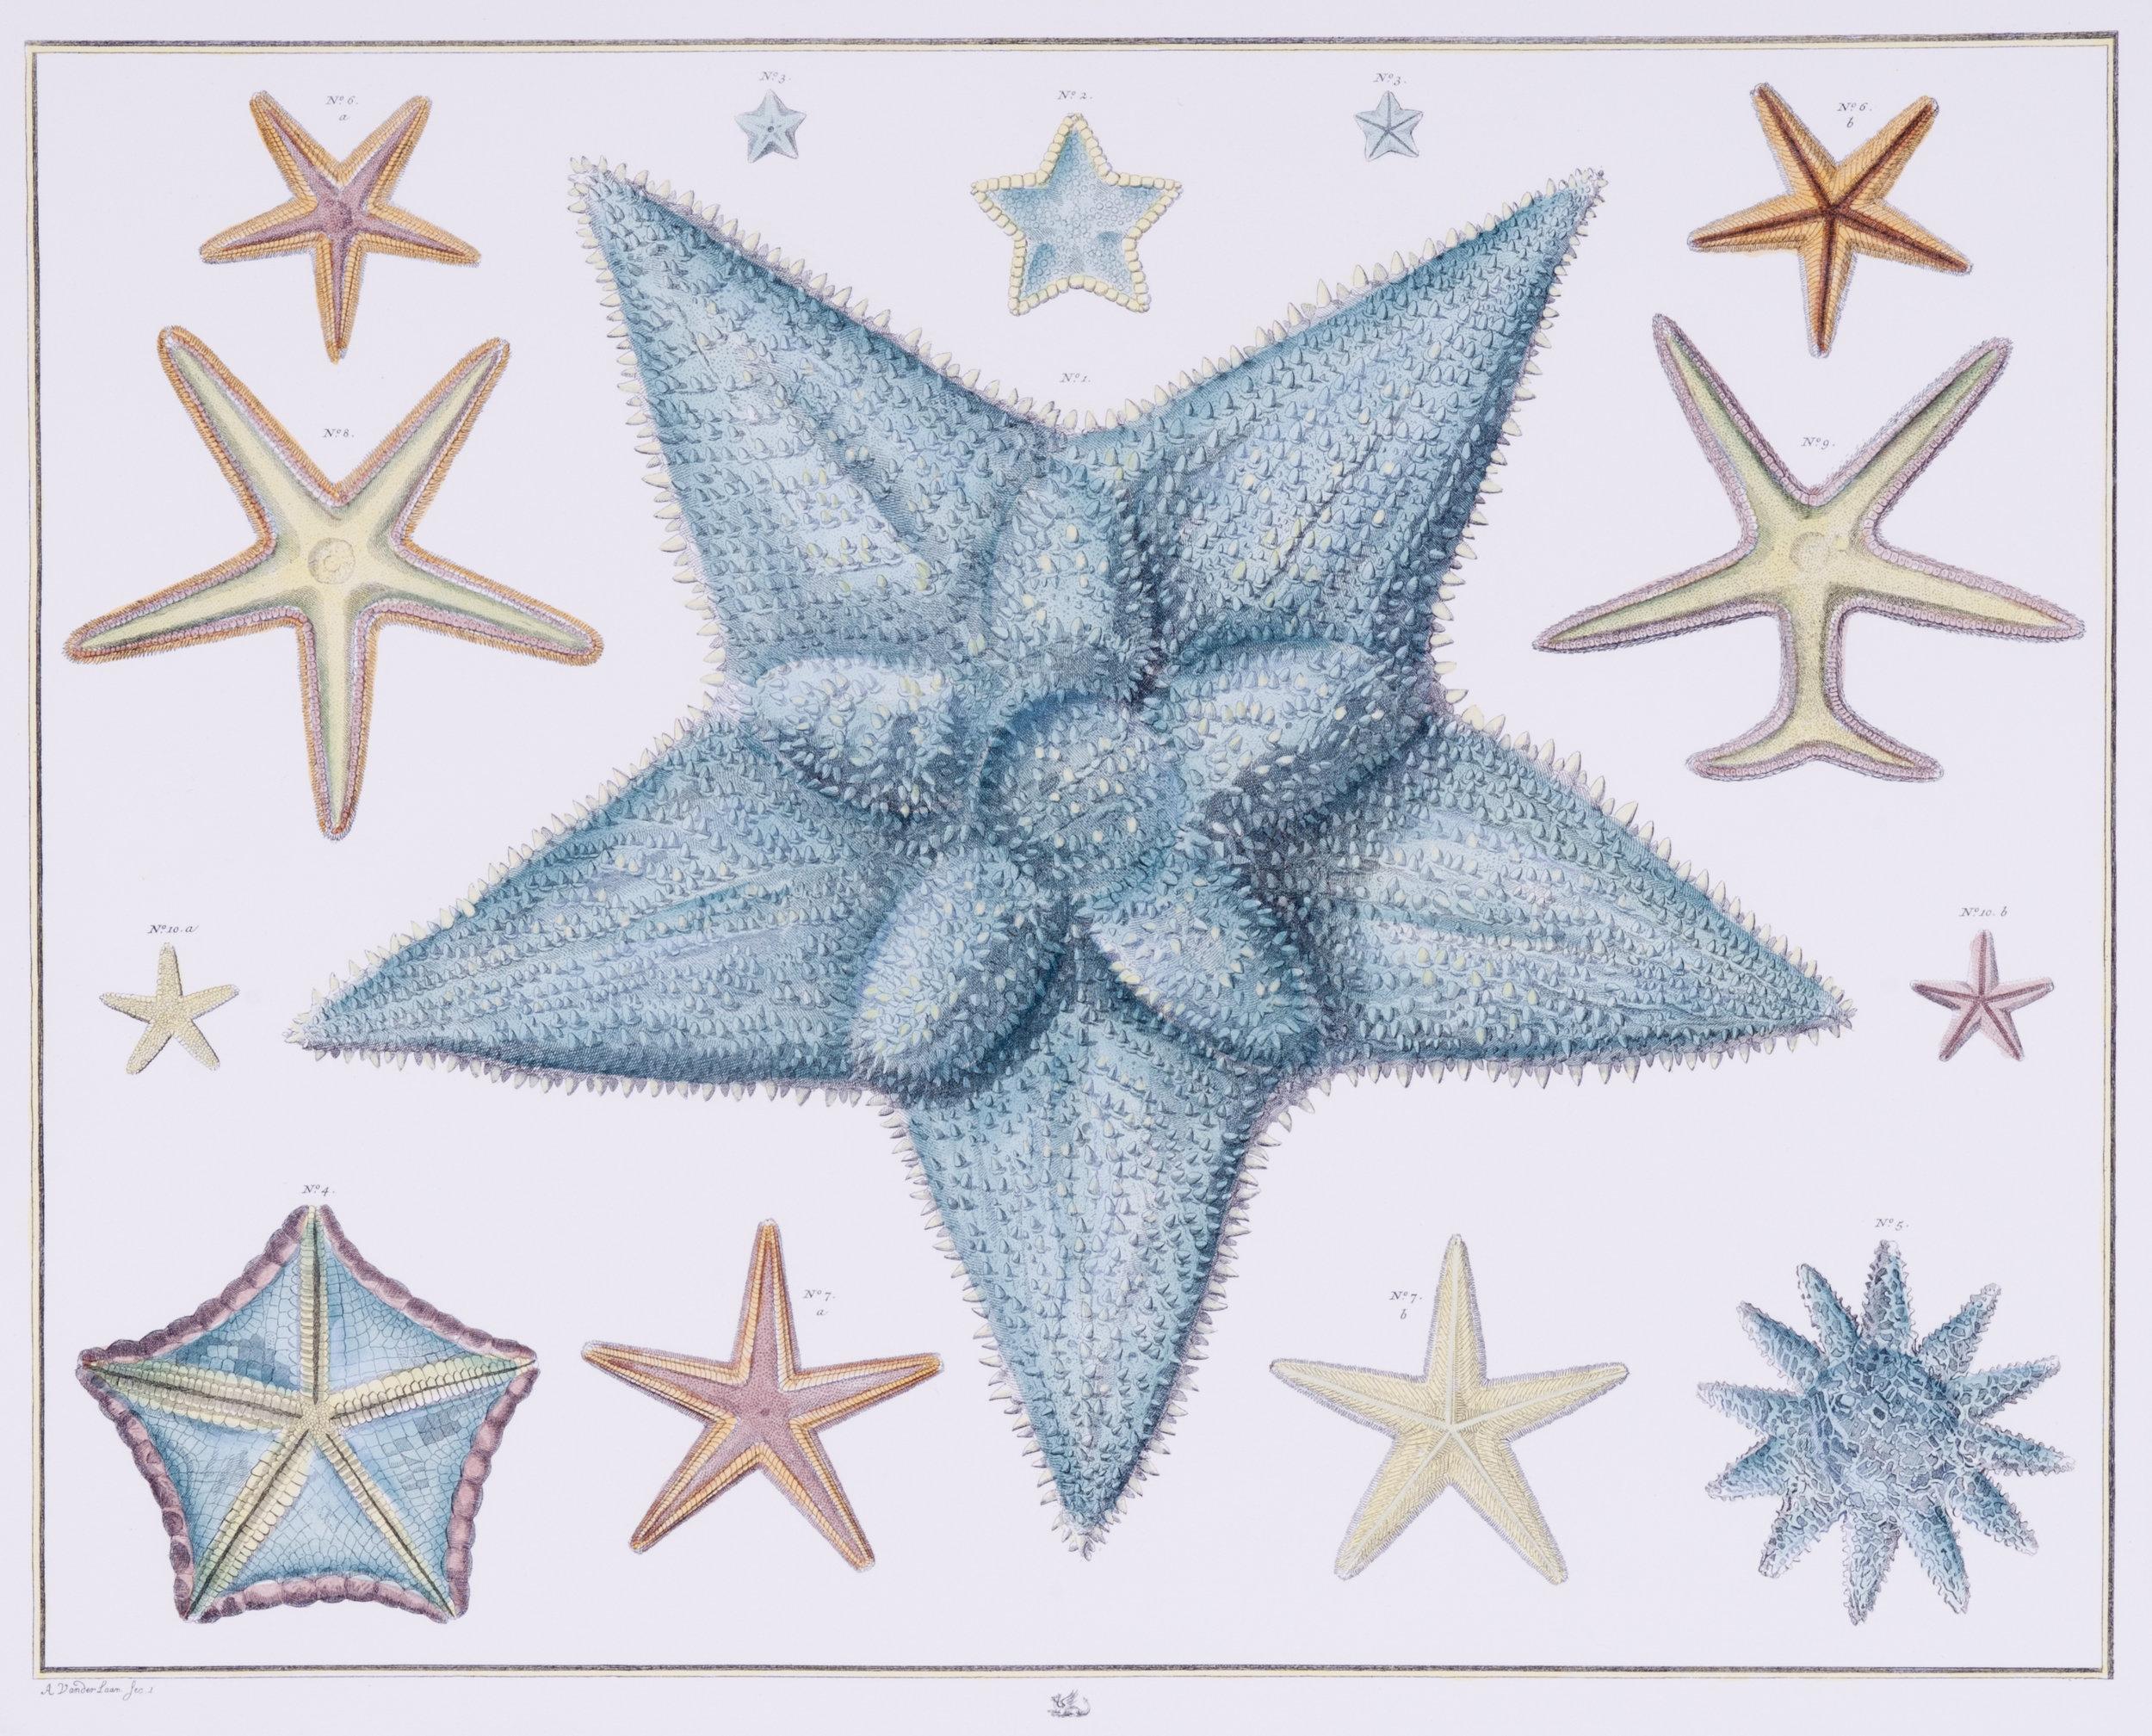 Starfish Specimen